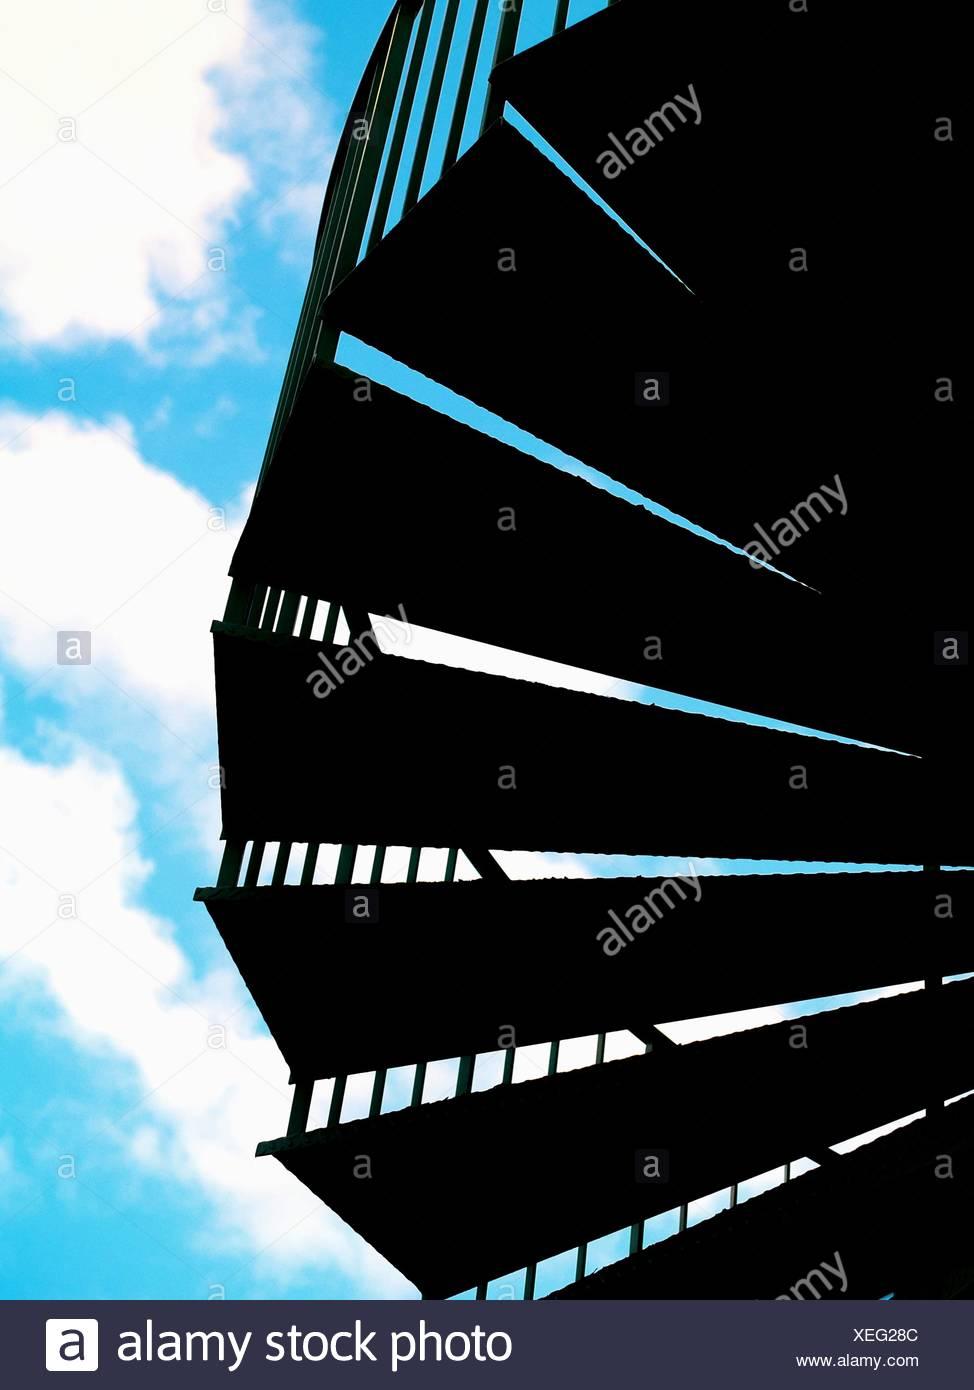 Low Angle View Of Silhouette Mesures contre Ciel nuageux Photo Stock